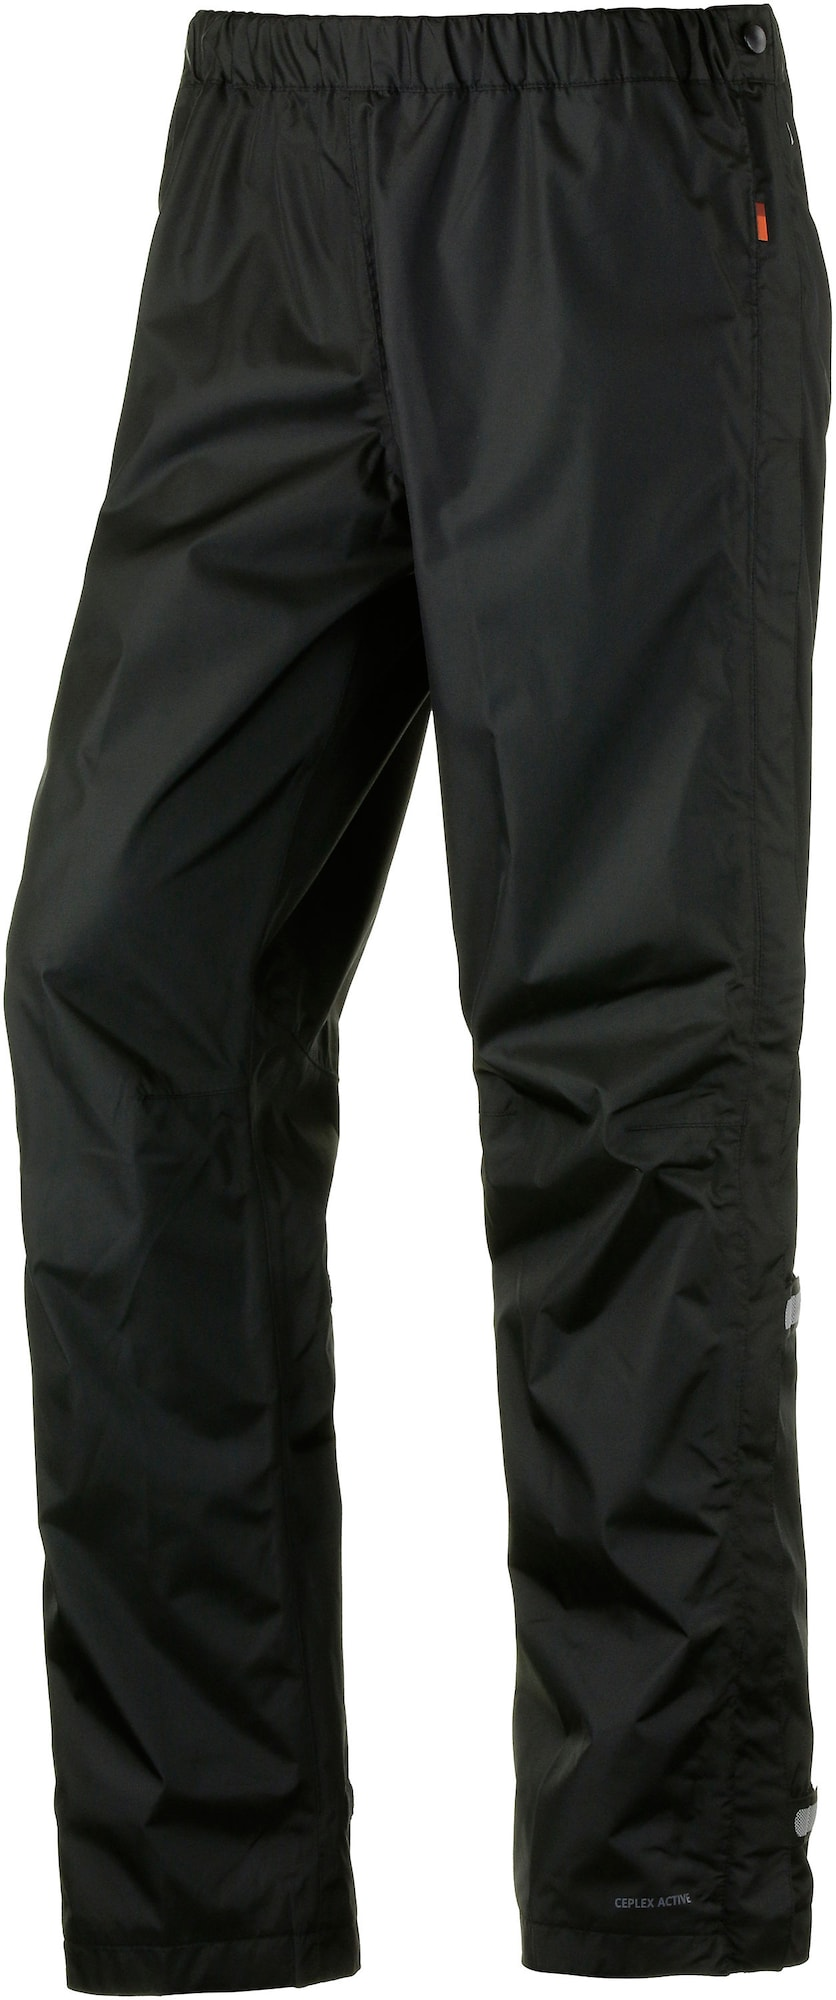 Fluid Zip Regenhose   Sportbekleidung > Sporthosen > Regenhosen   Vaude